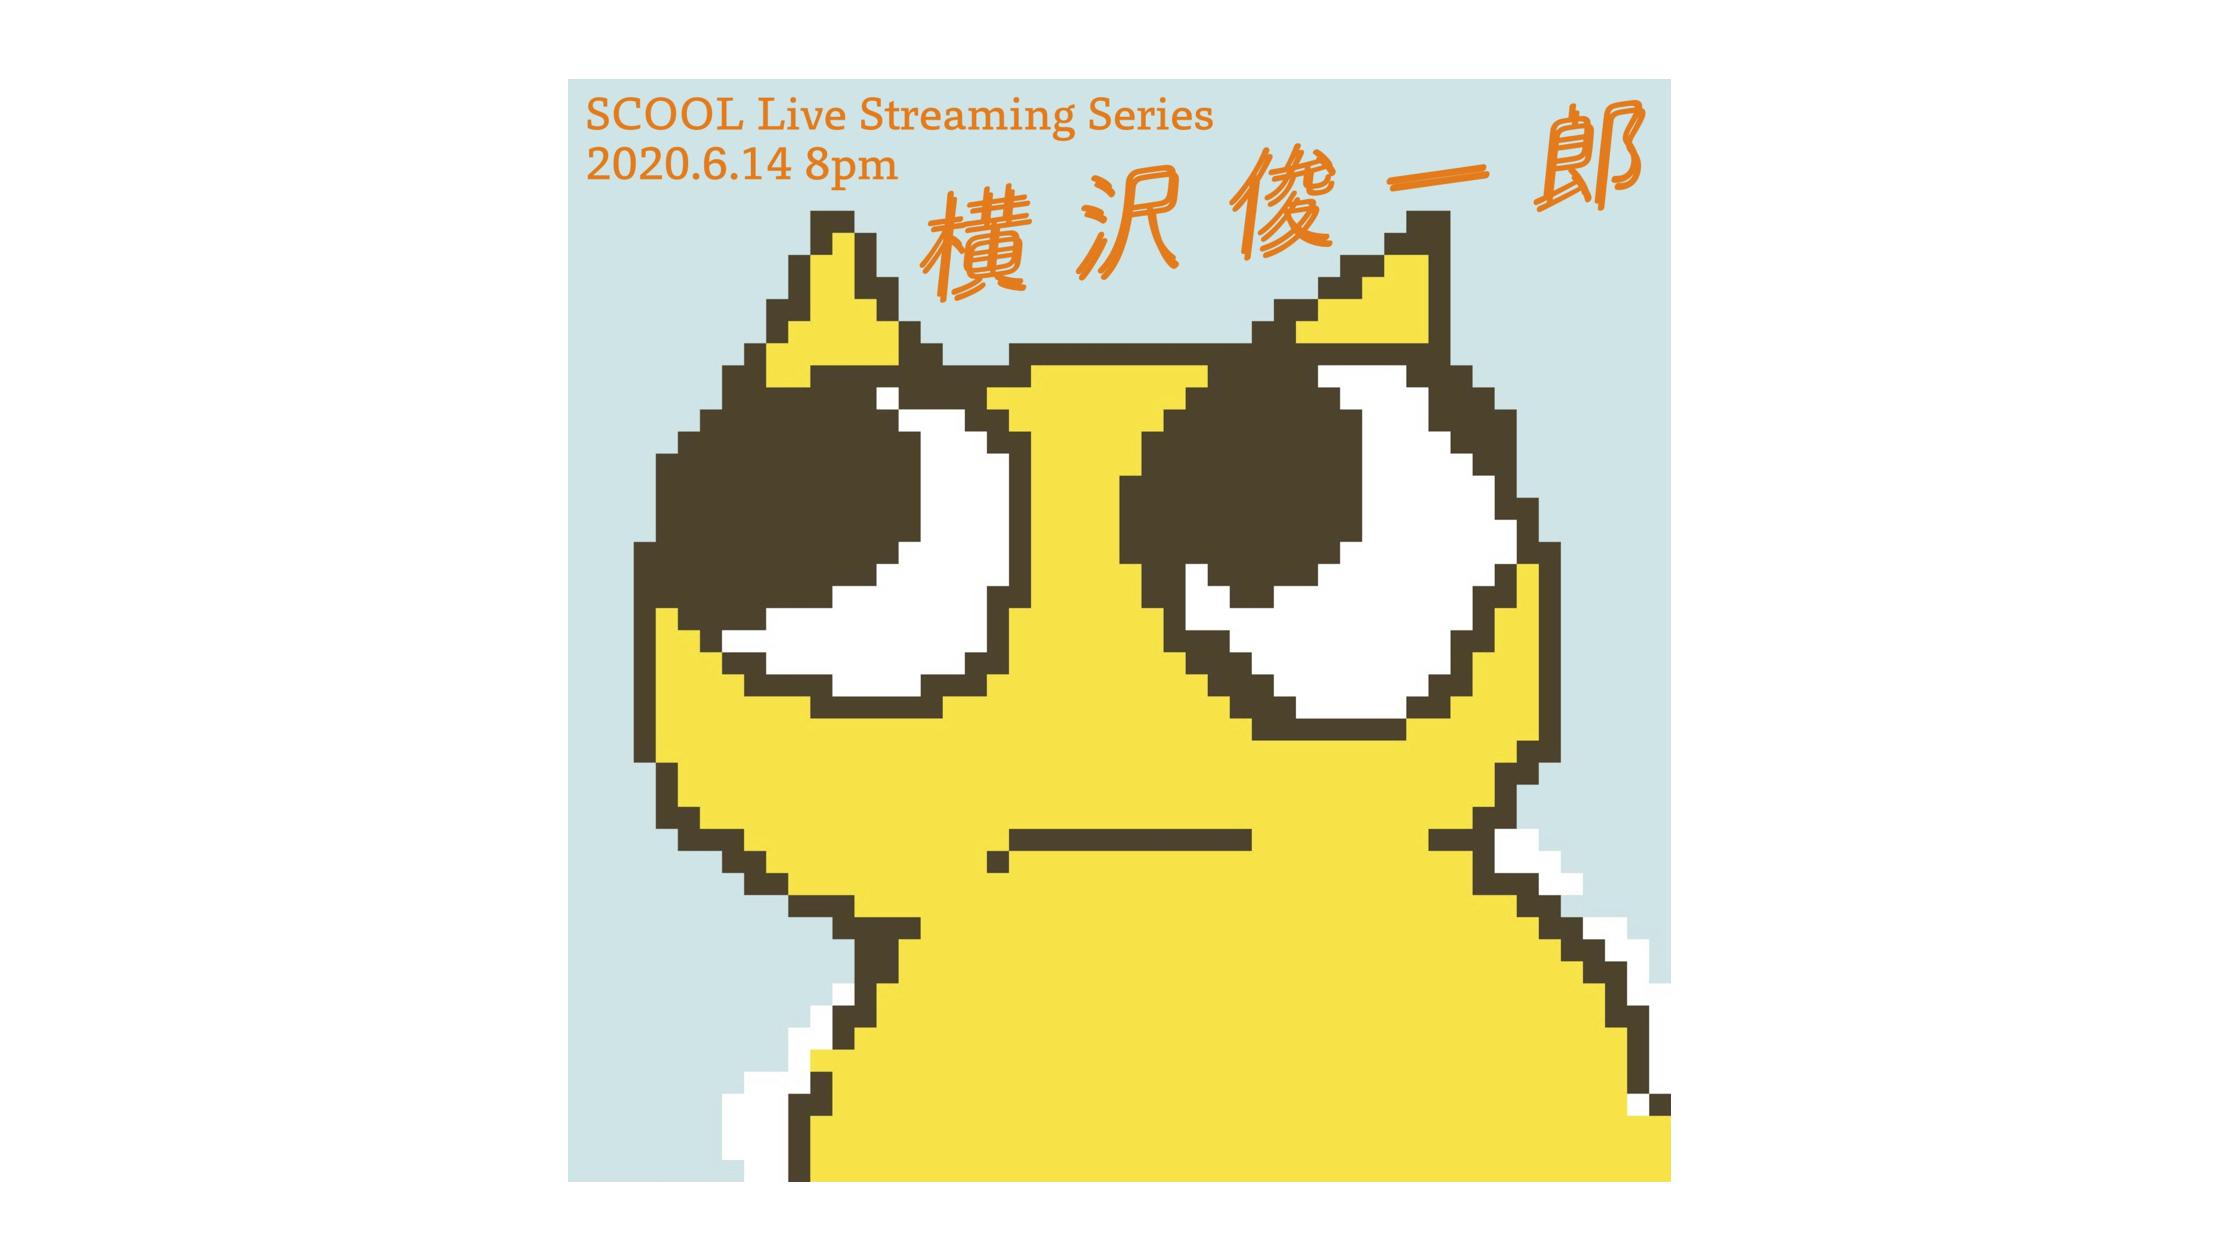 SCOOL Live Streaming Series<br>横沢俊一郎